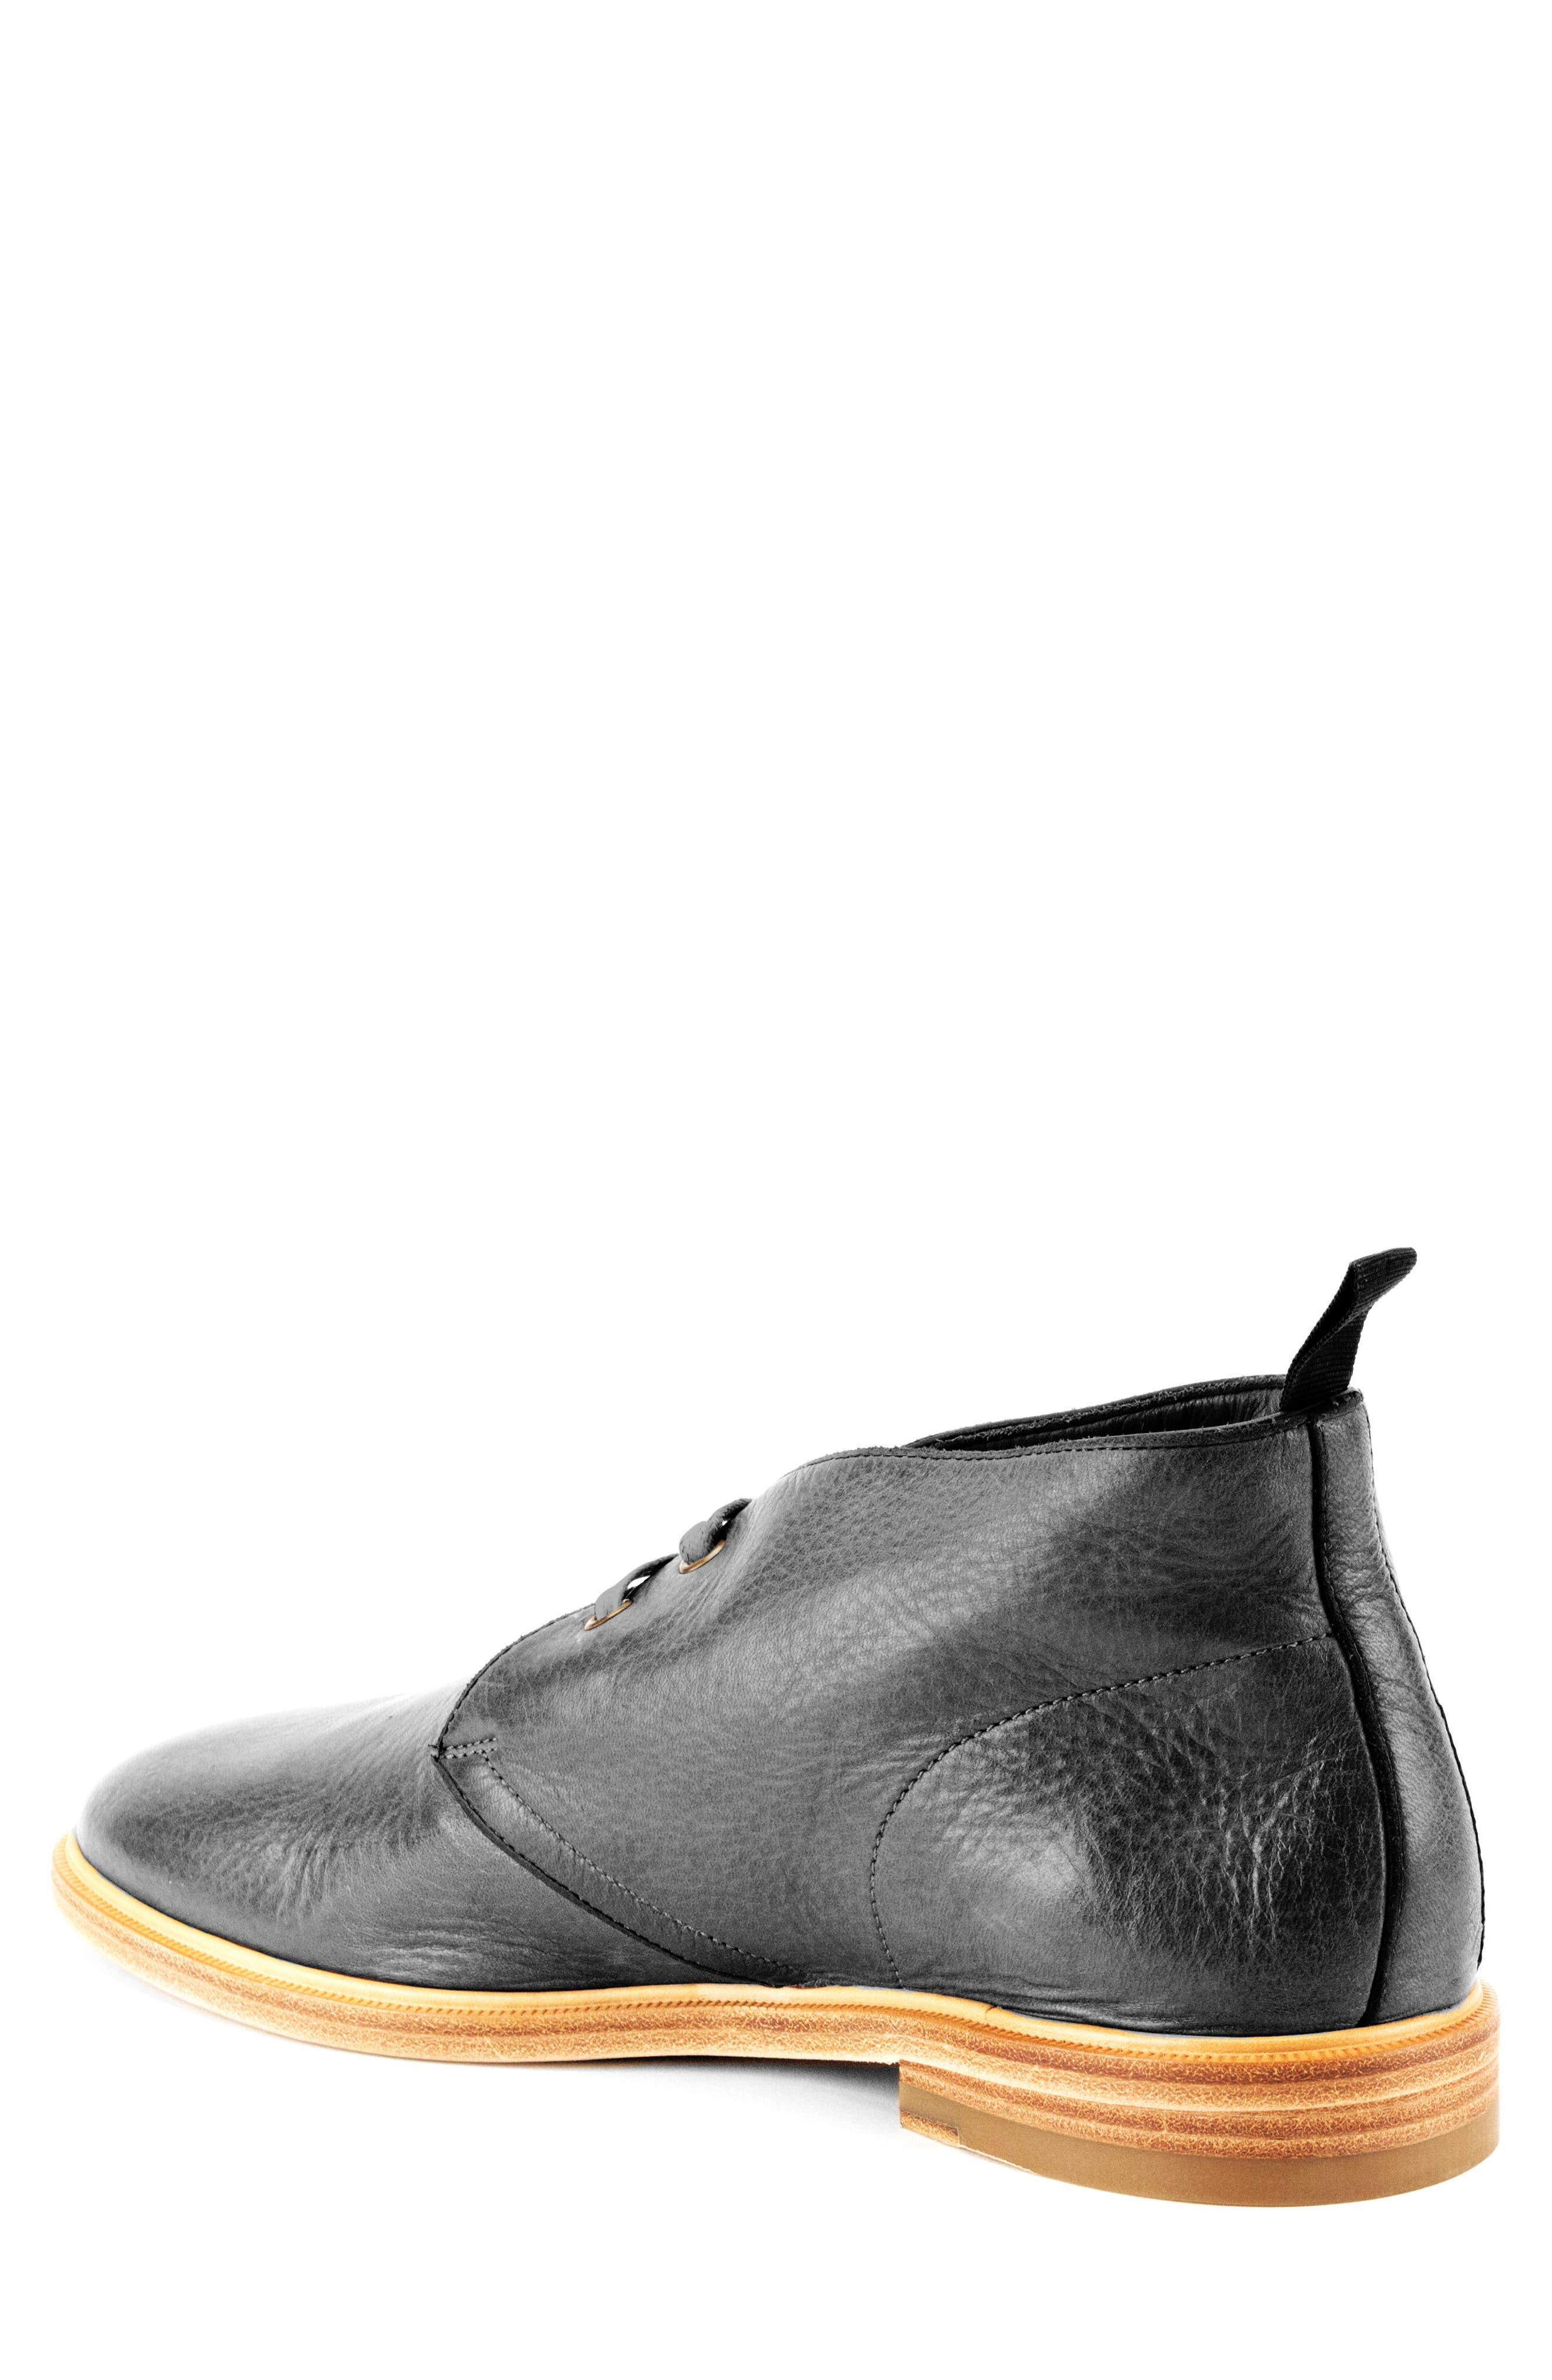 Luke Chukka Boot,                             Alternate thumbnail 2, color,                             Black Leather